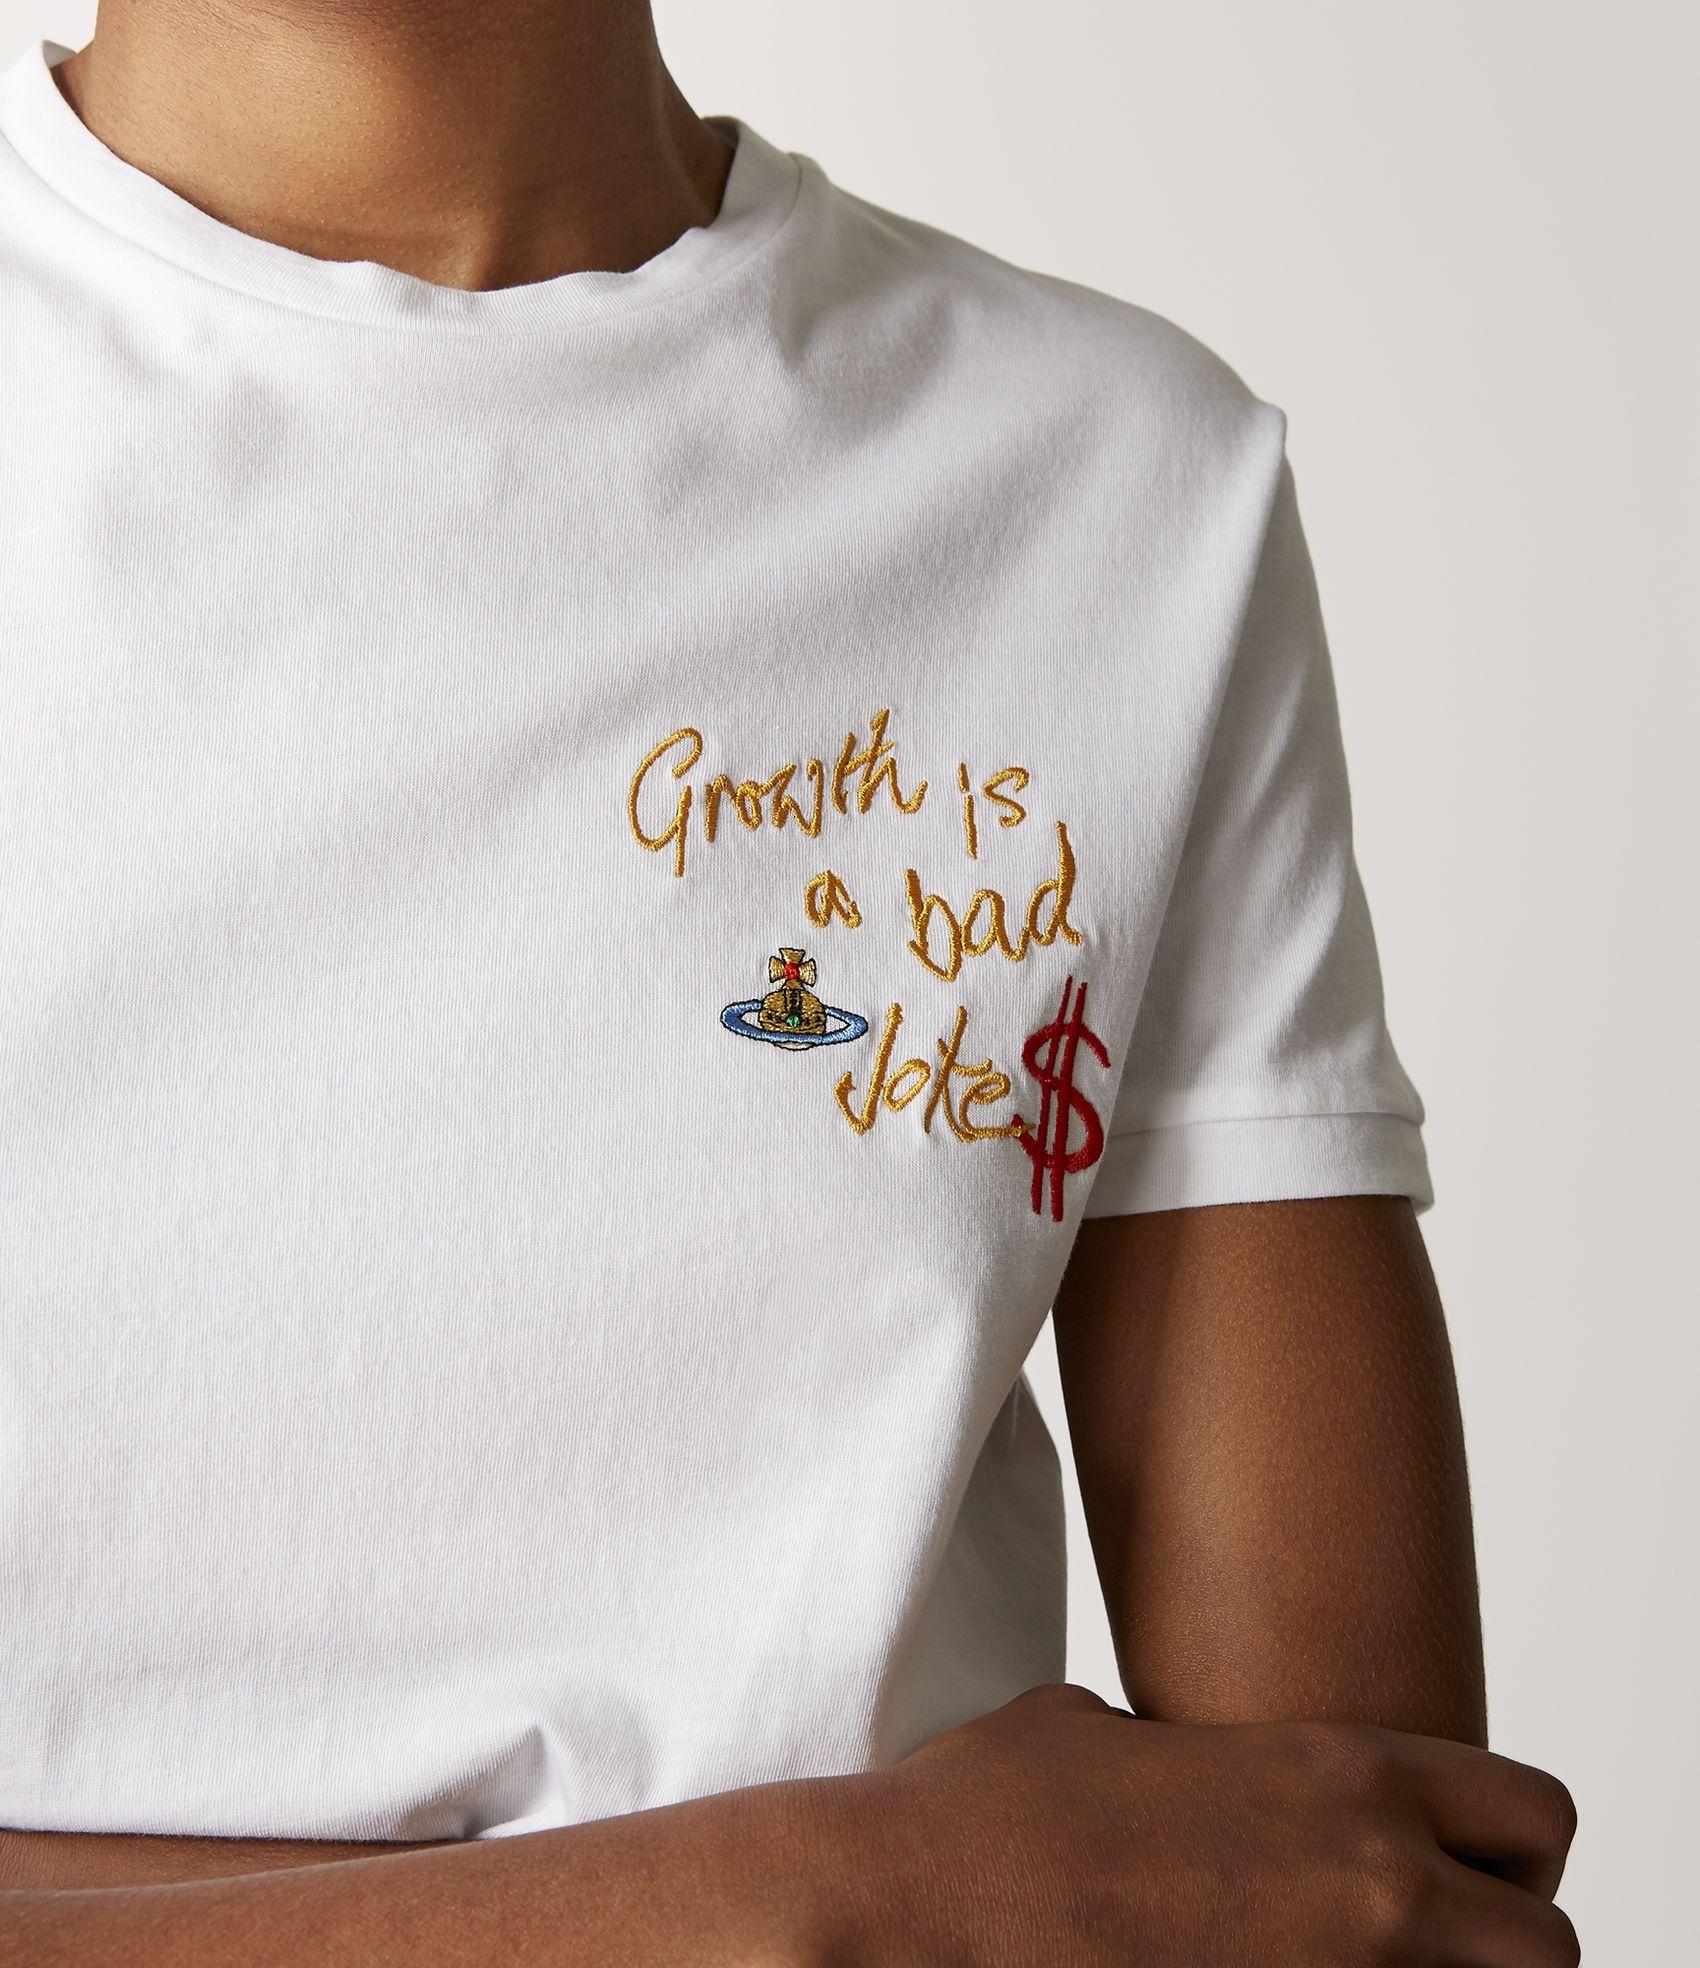 418ce6b8f68b Vivienne Westwood T-Shirts   Women's cloting   Vivienne Westwood - Growth  Is A Bad Joke Peru T-Shirt White